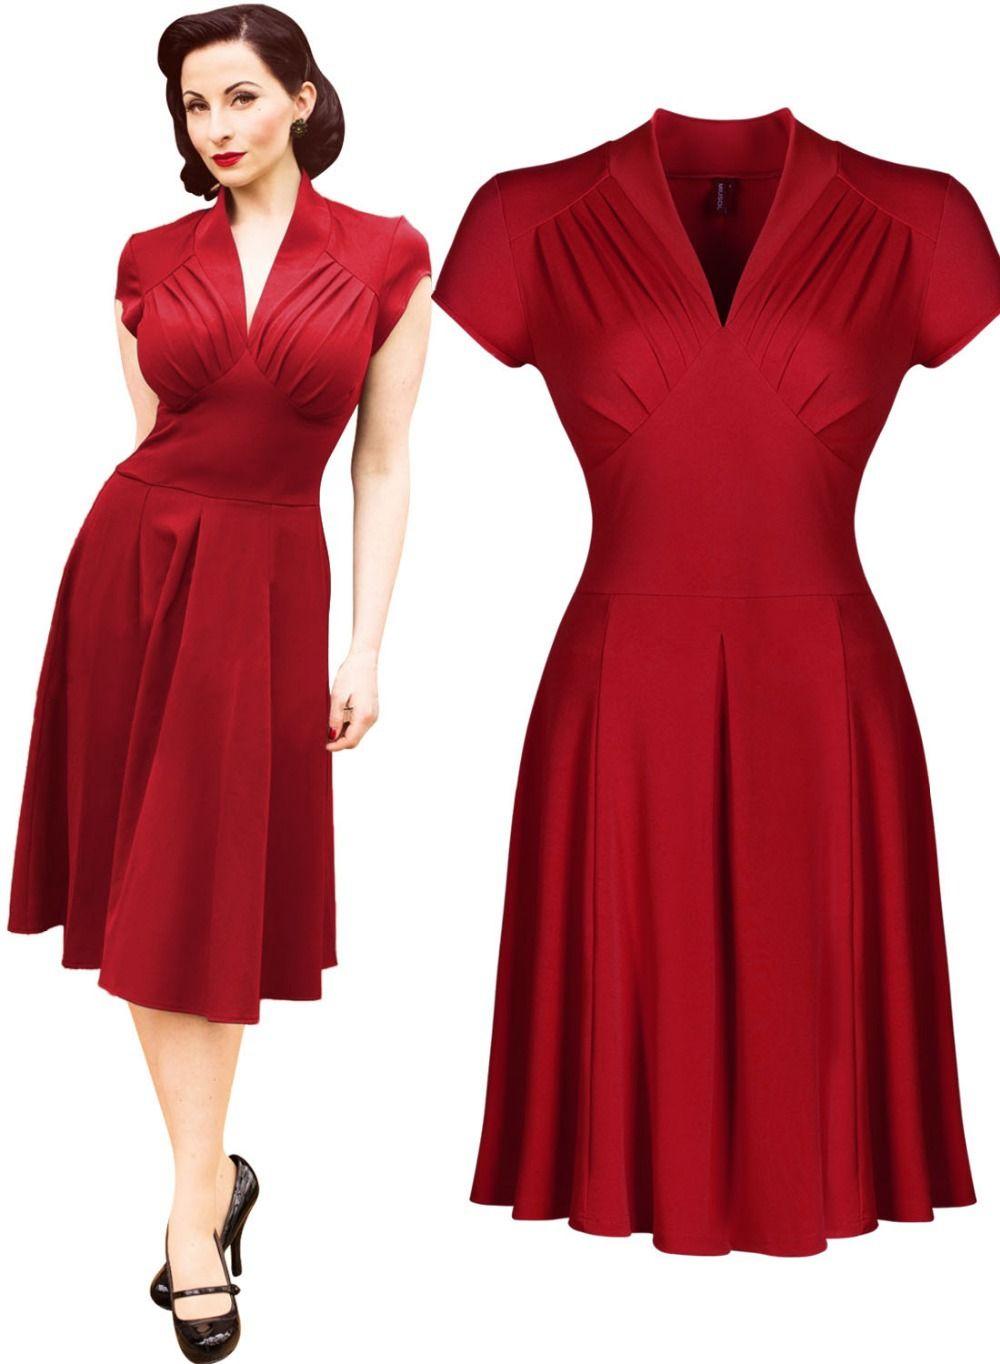 I uc this womenus vintage style retro s shirtwaist flared